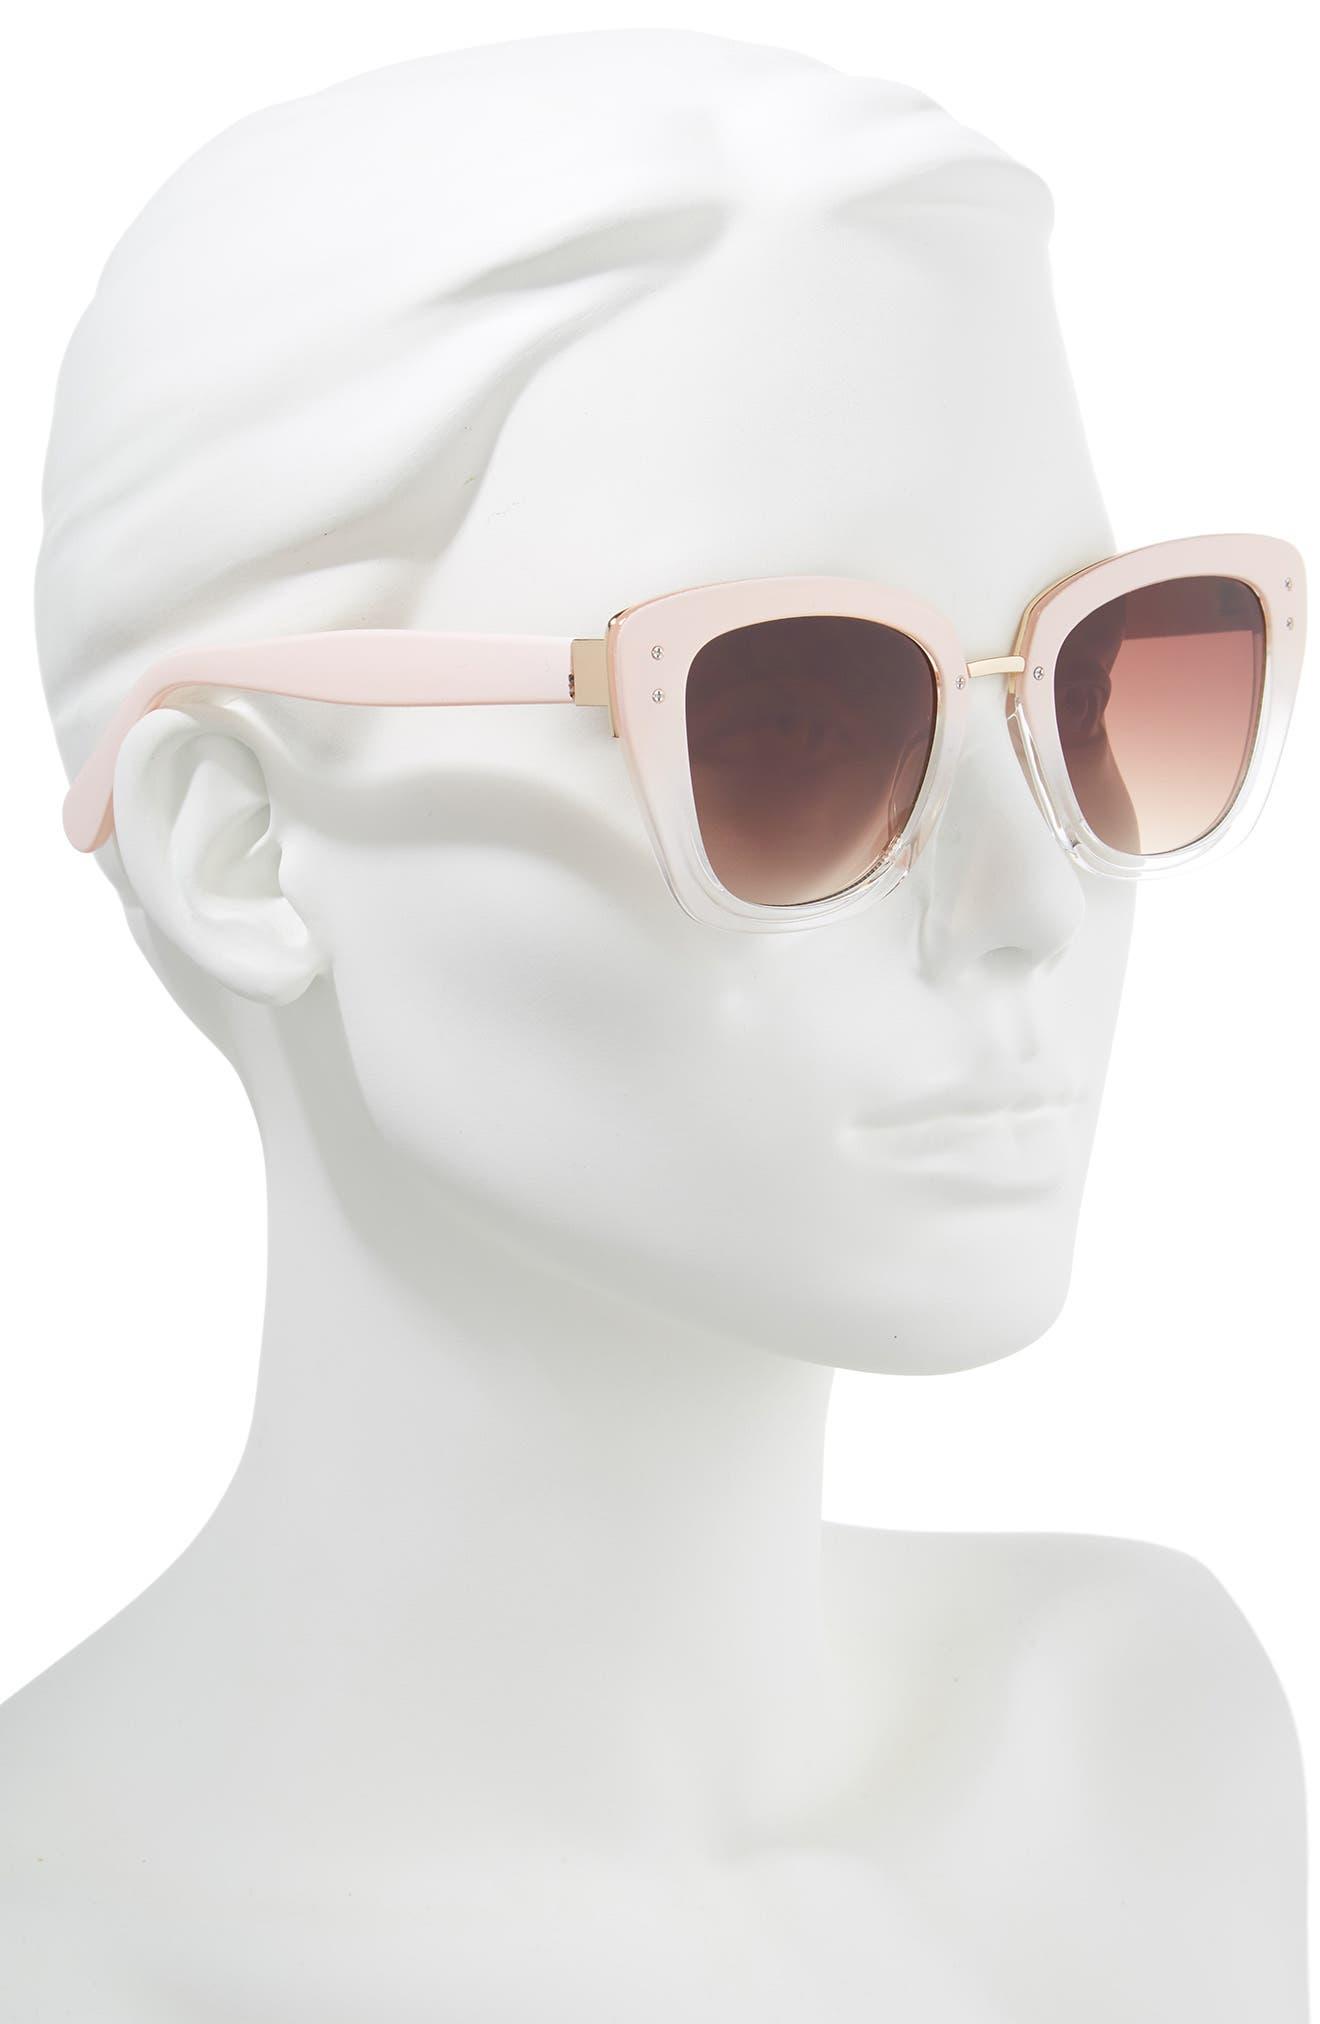 51mm Ombré Square Sunglasses,                             Alternate thumbnail 2, color,                             Pink/ Clear